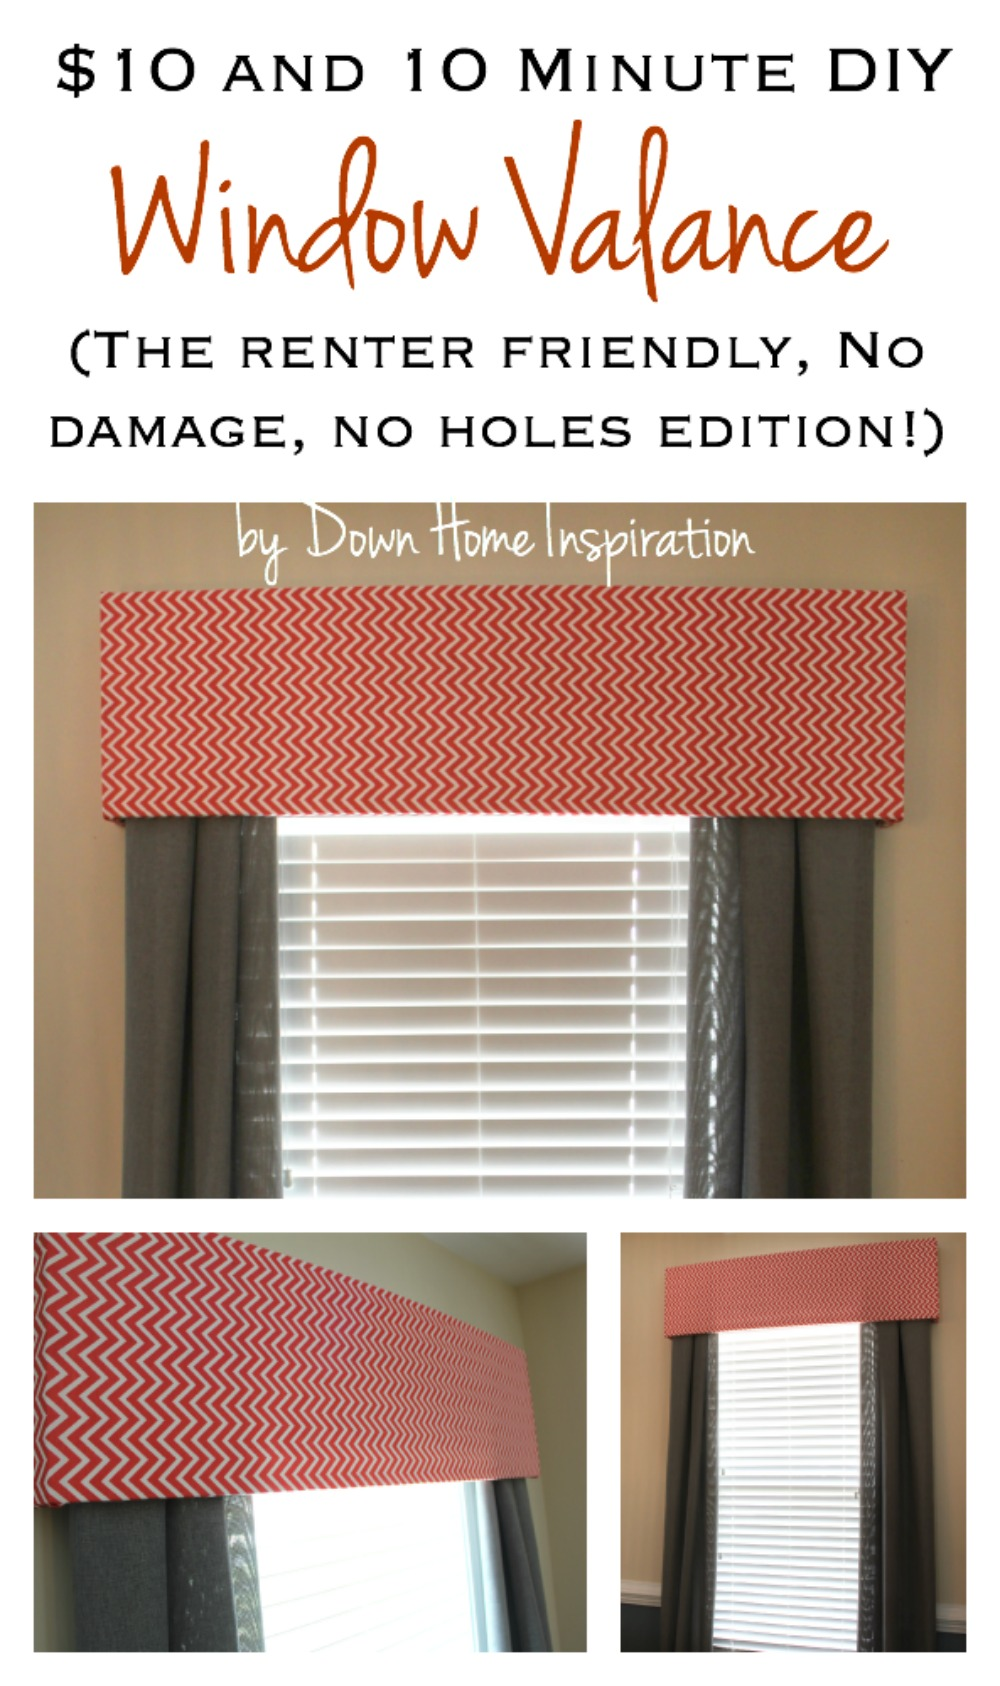 Renter Friendly, No Holes, No Damage $10 and 10 Minute DIY Window ...